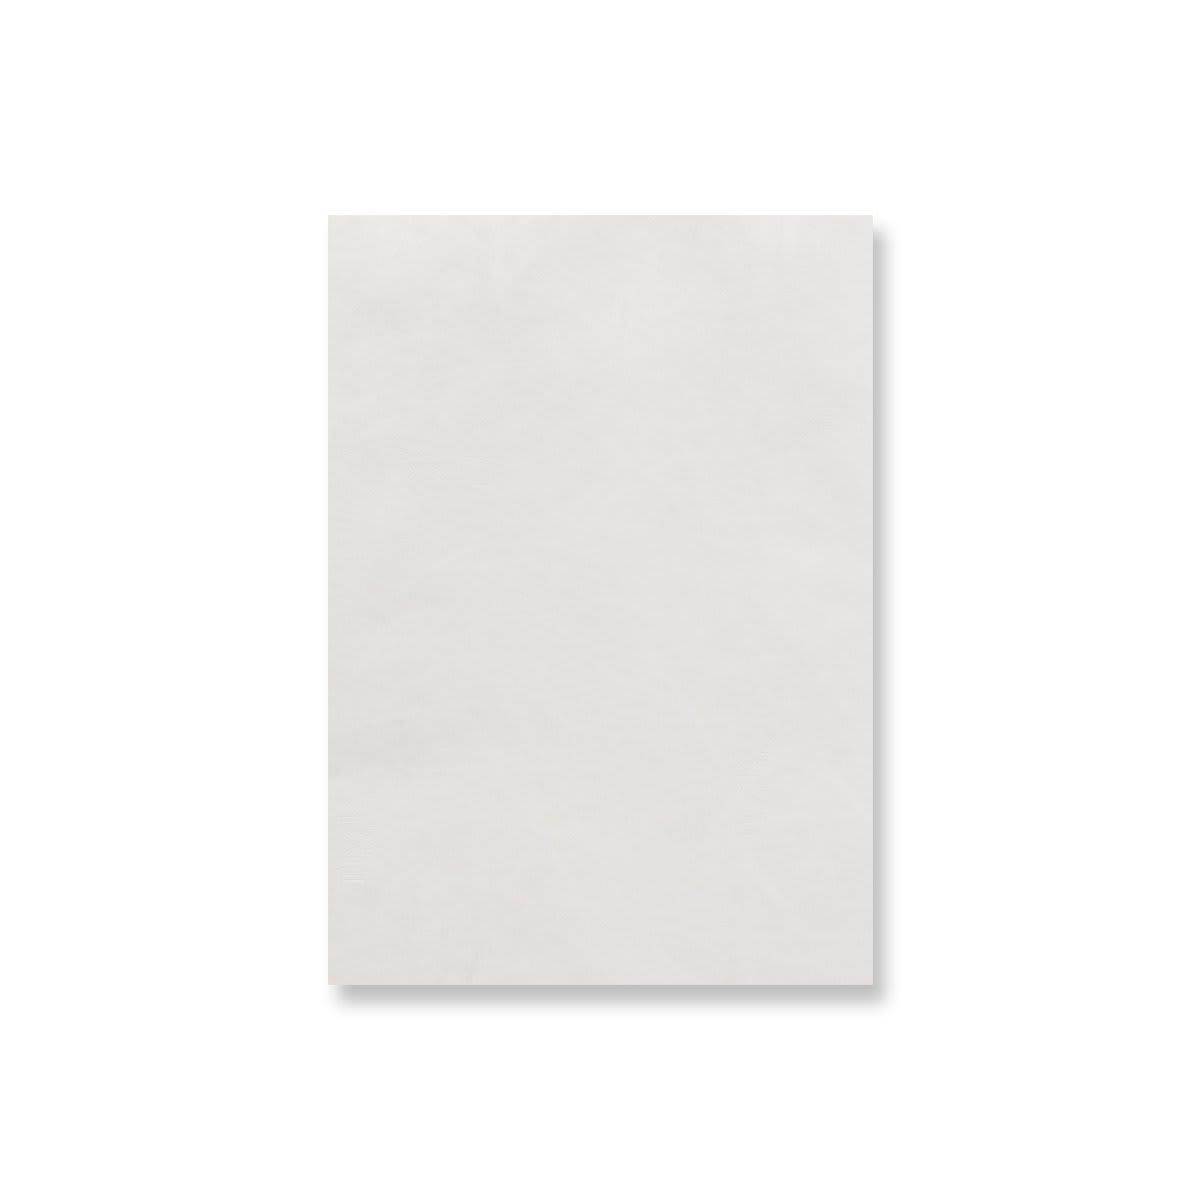 C5 WHITE TYVEK ENVELOPES